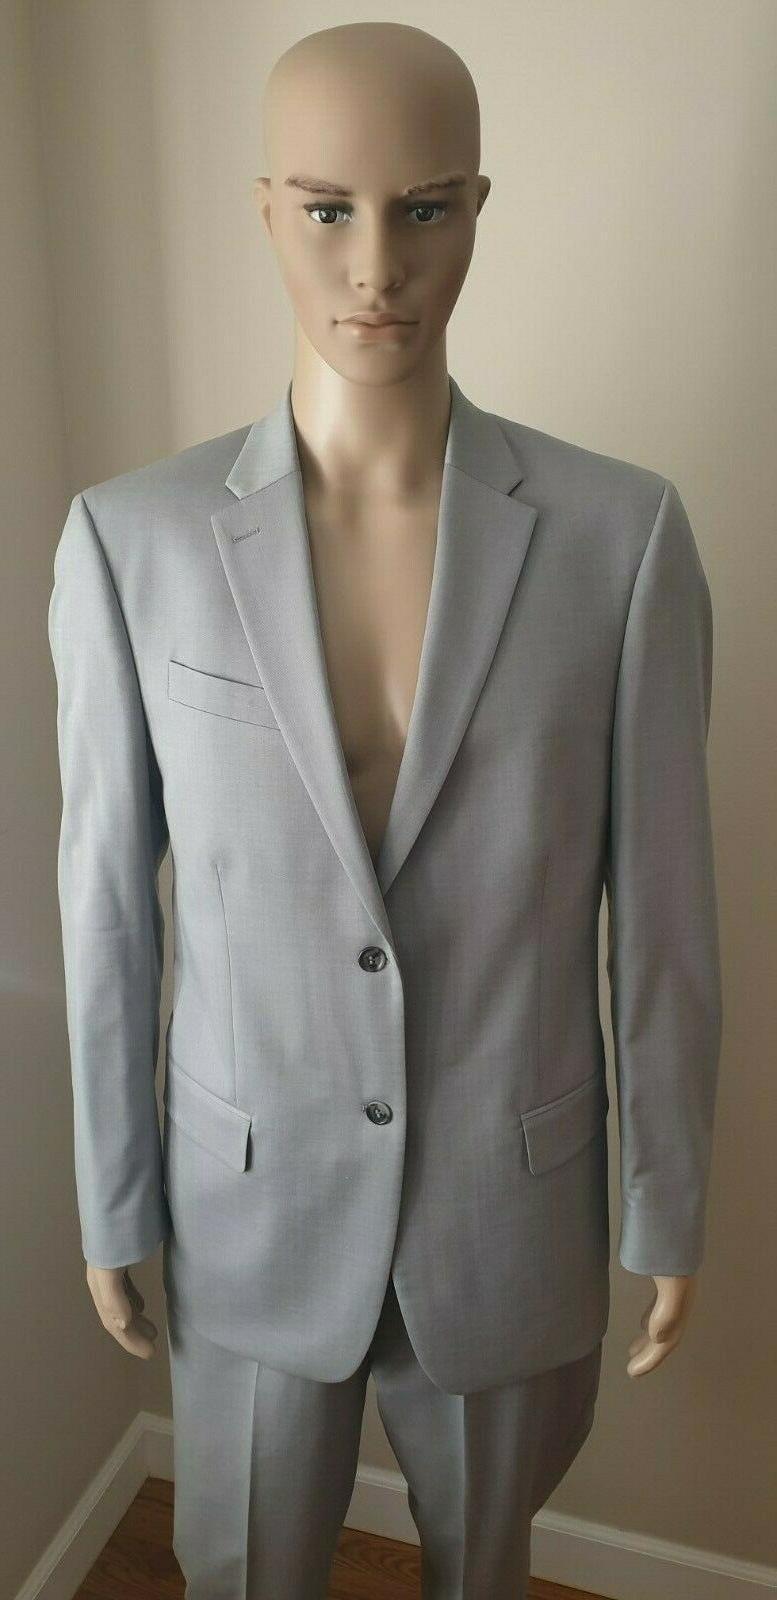 CALVIN CK Men's Dress Suit Light Gray Regular x 32 Pants NEW